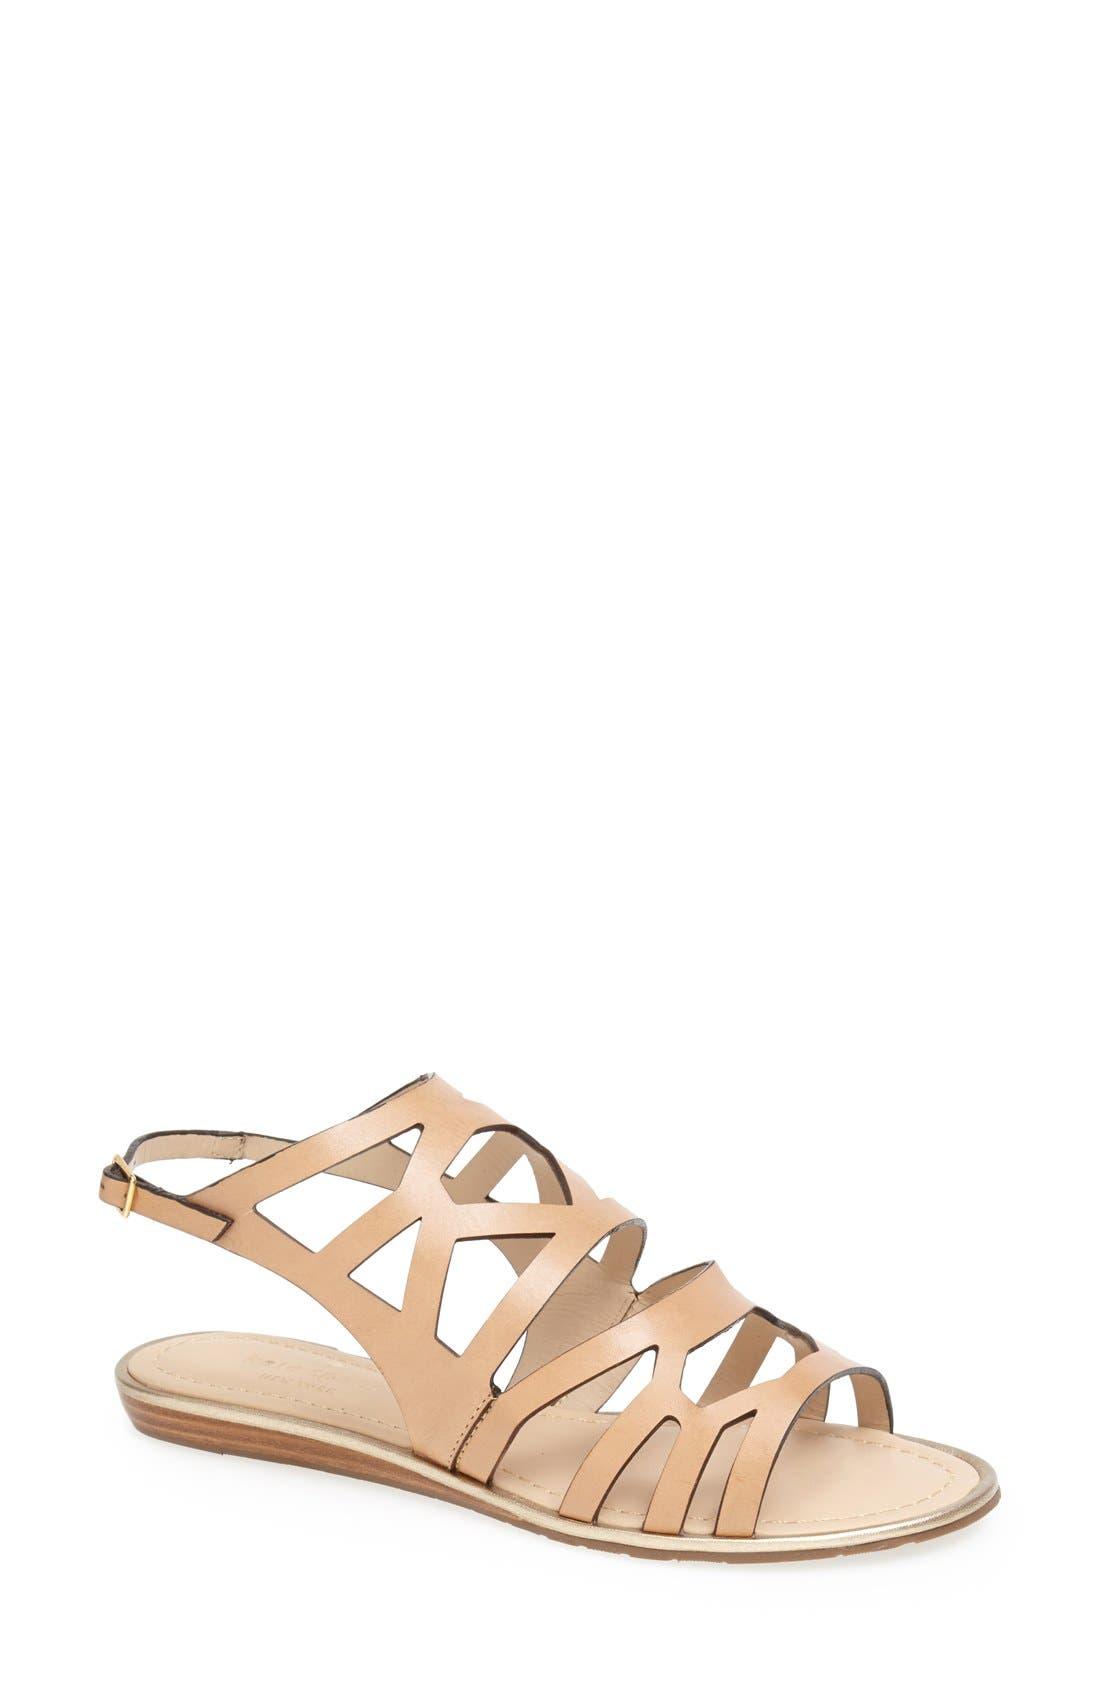 Main Image - kate spade new york 'aster' flat sandal